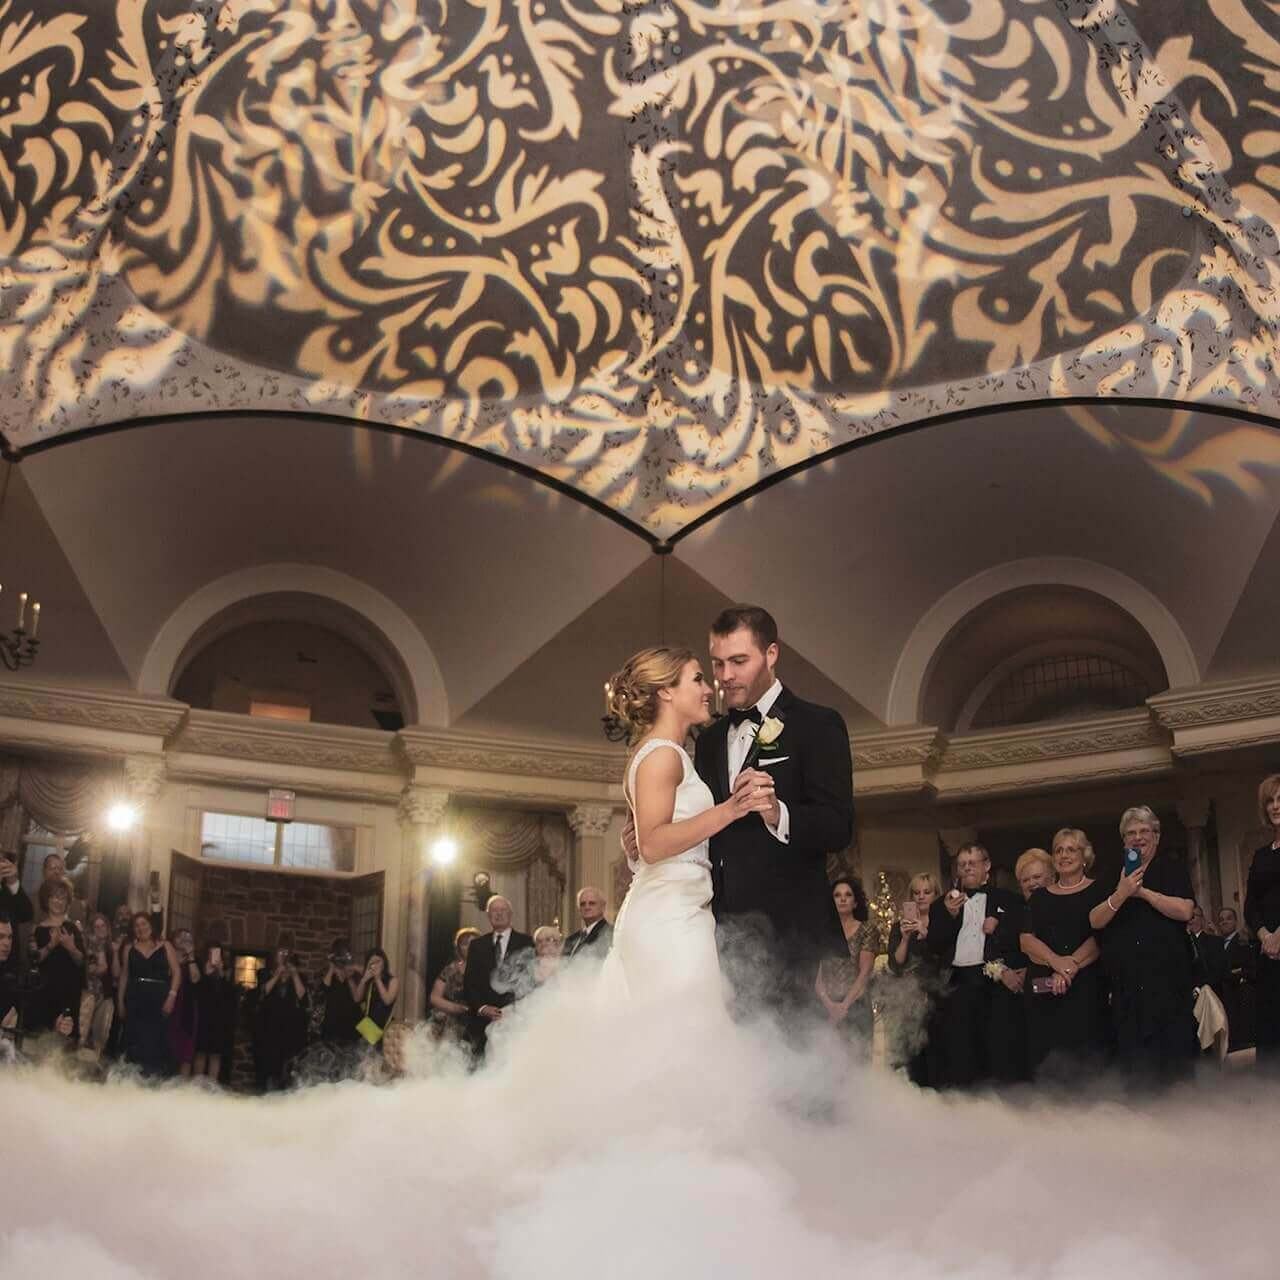 Special Wedding Lighting